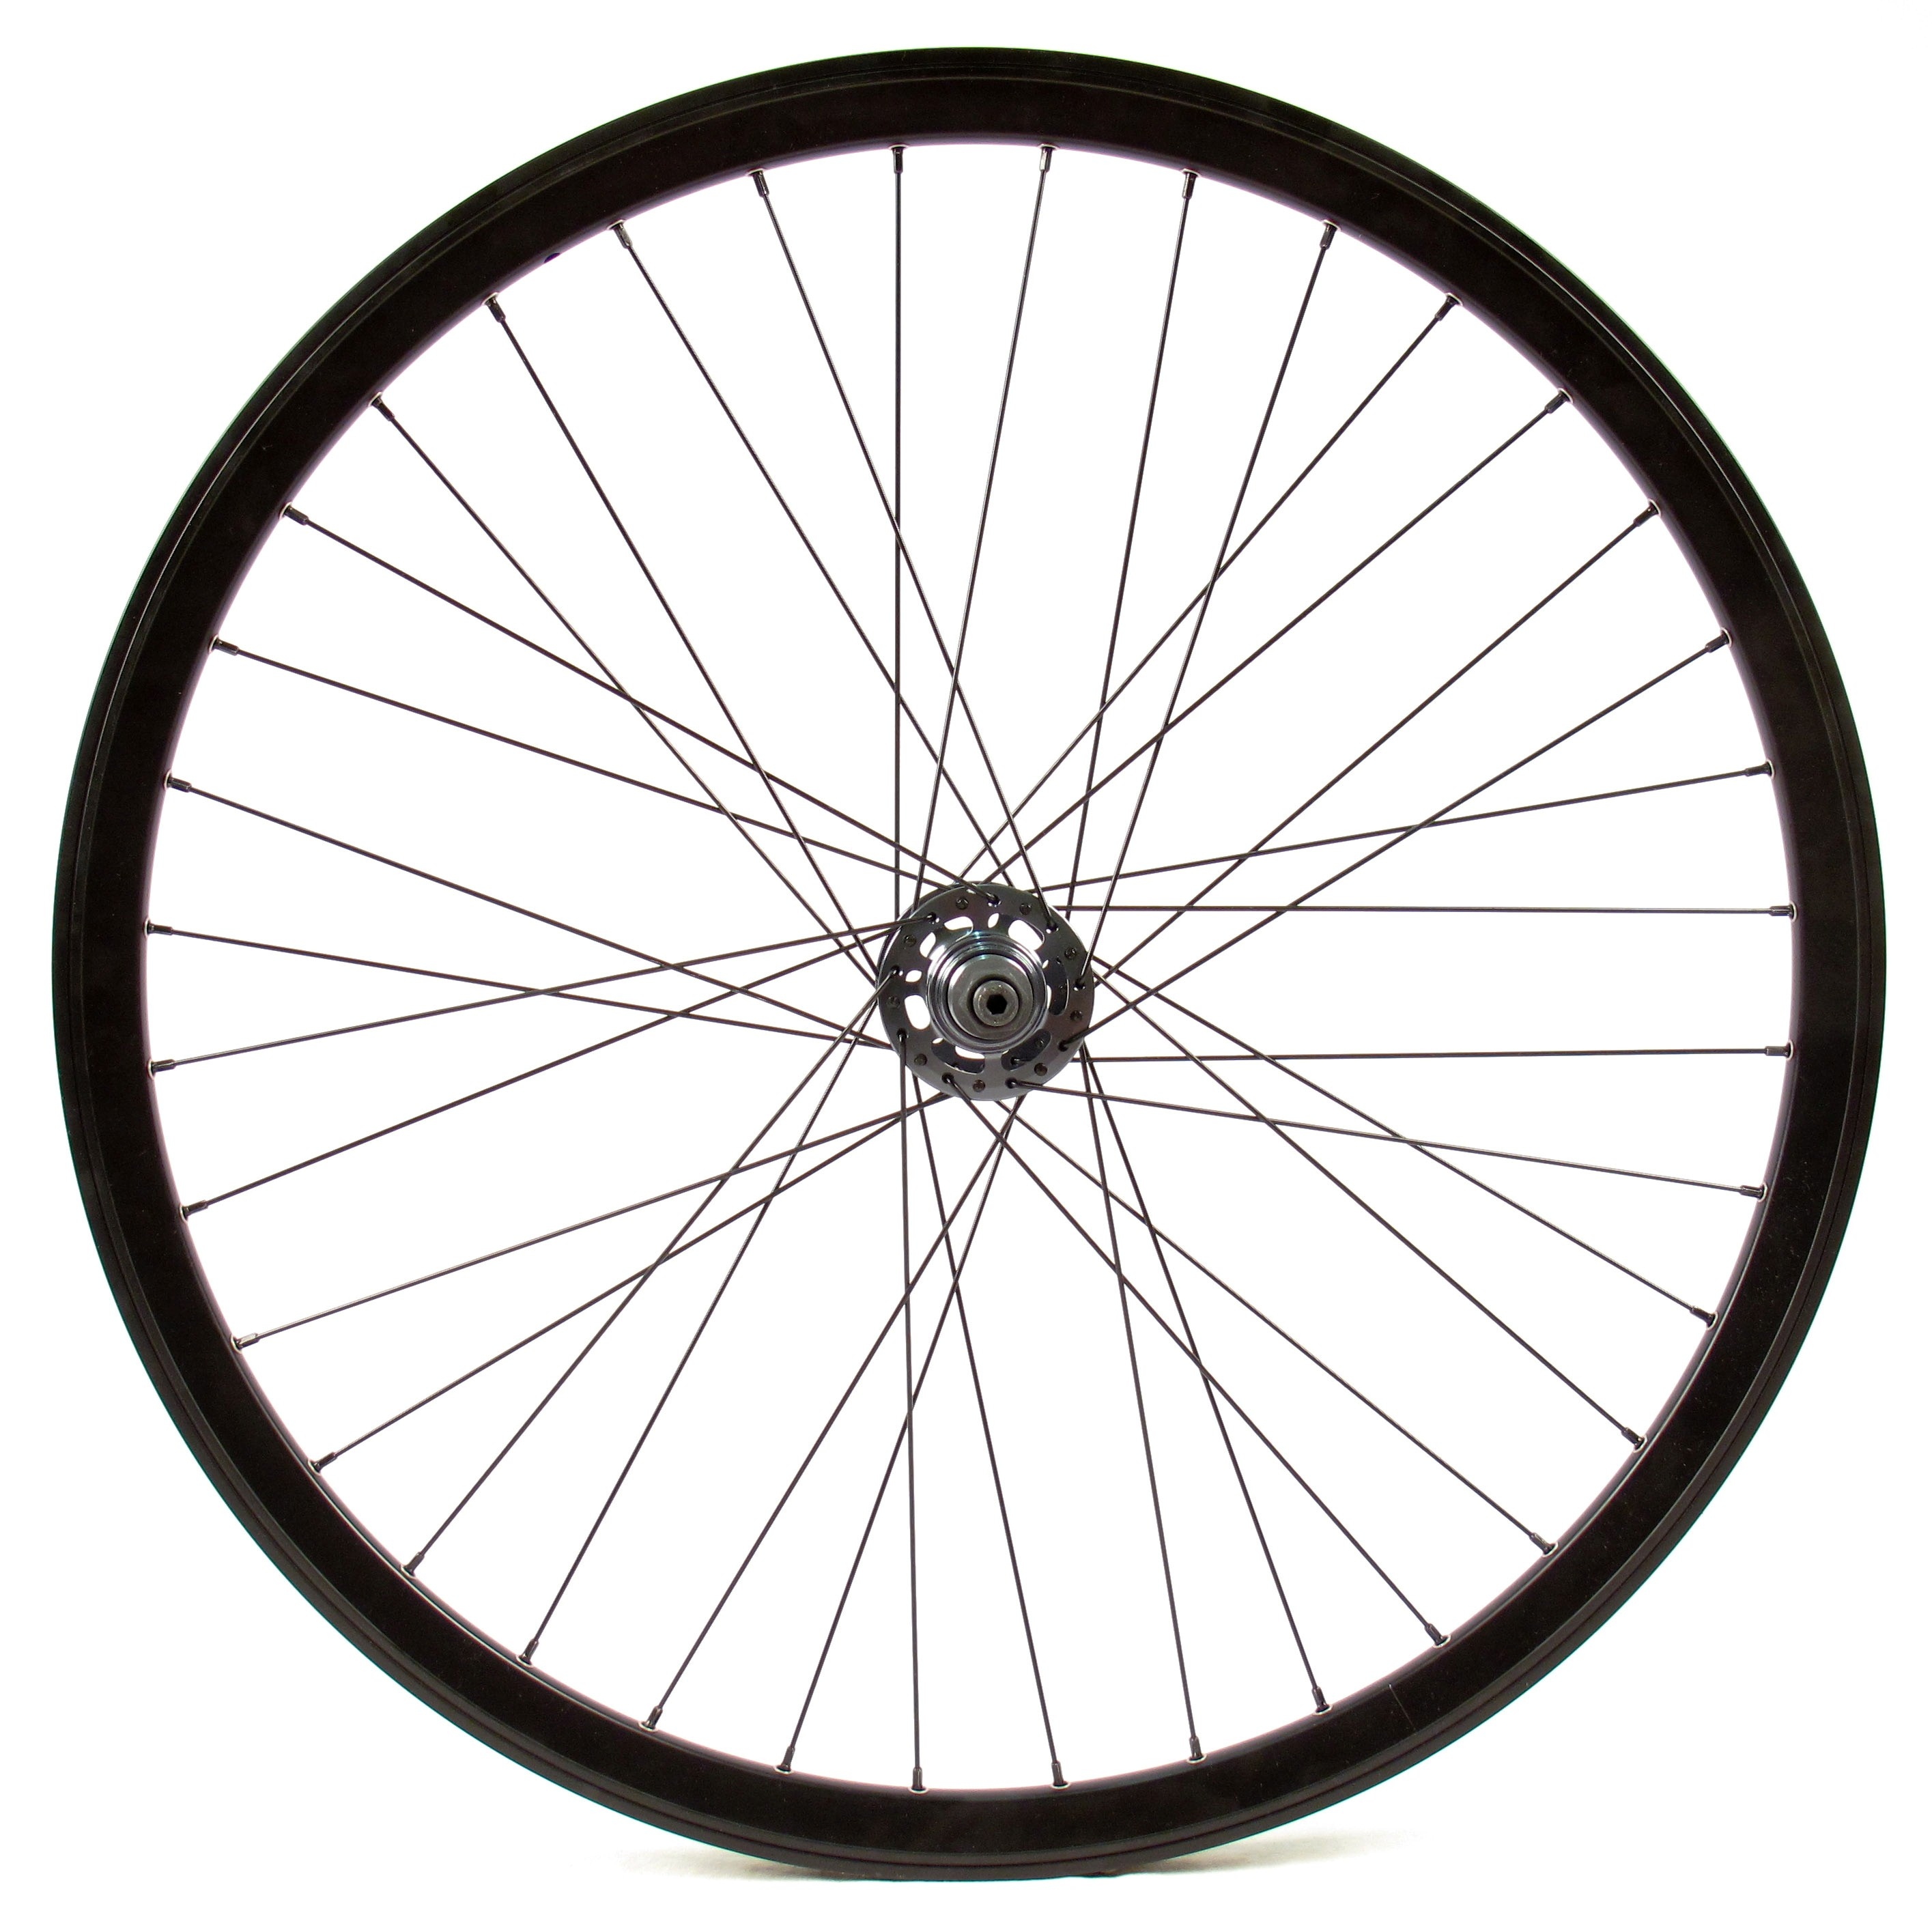 Bike wheels clipart svg royalty free stock Bicycle wheels clipart - Clip Art Library svg royalty free stock